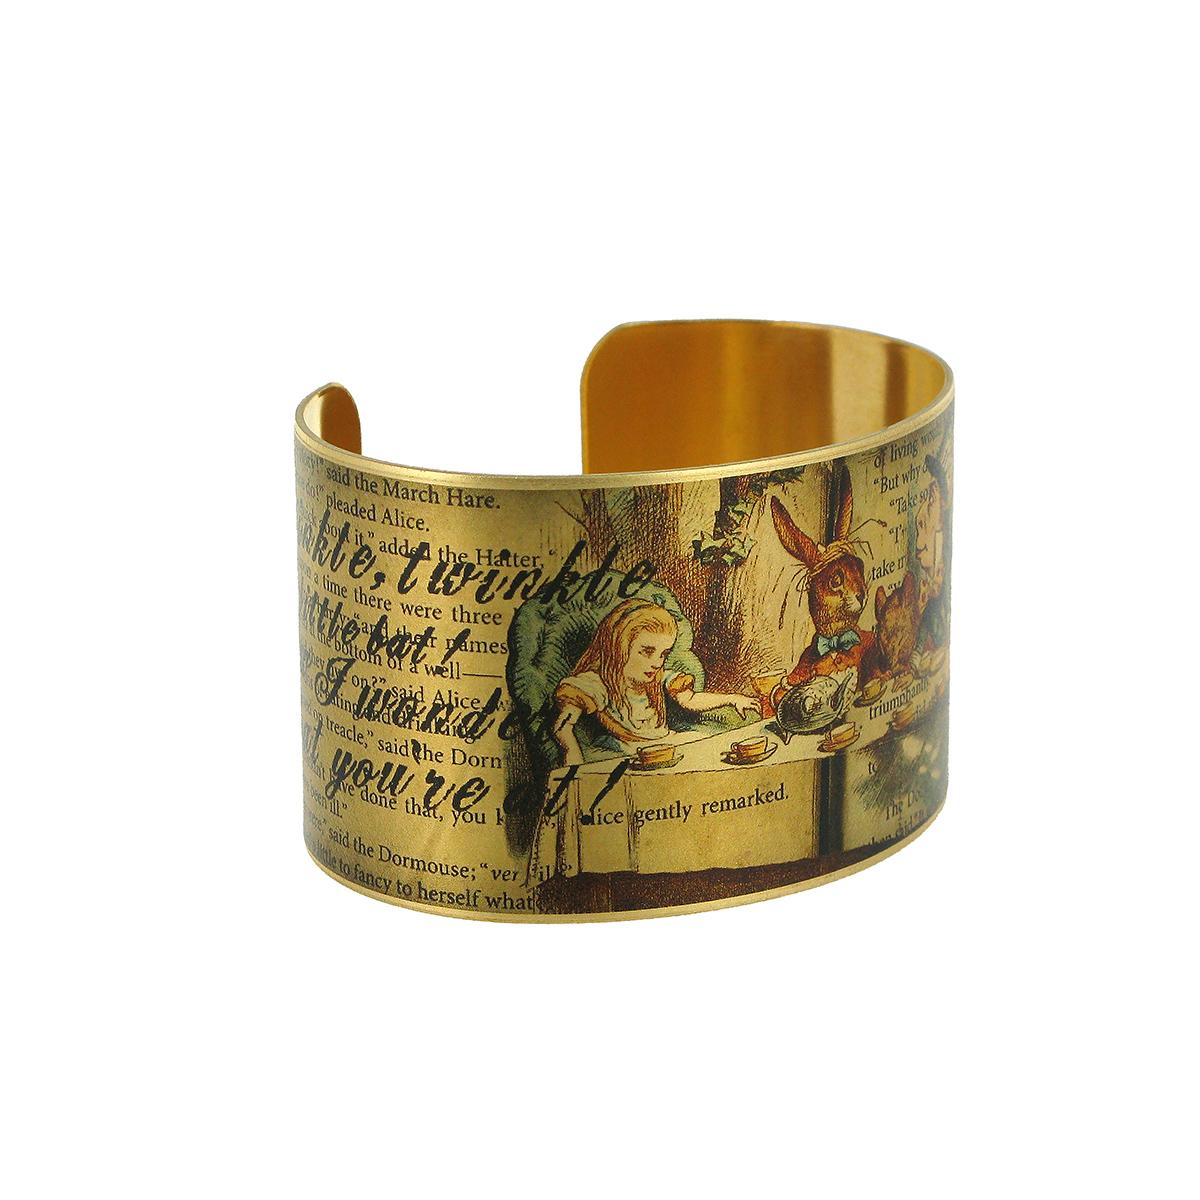 Alice in Wonderland bracelet cuff